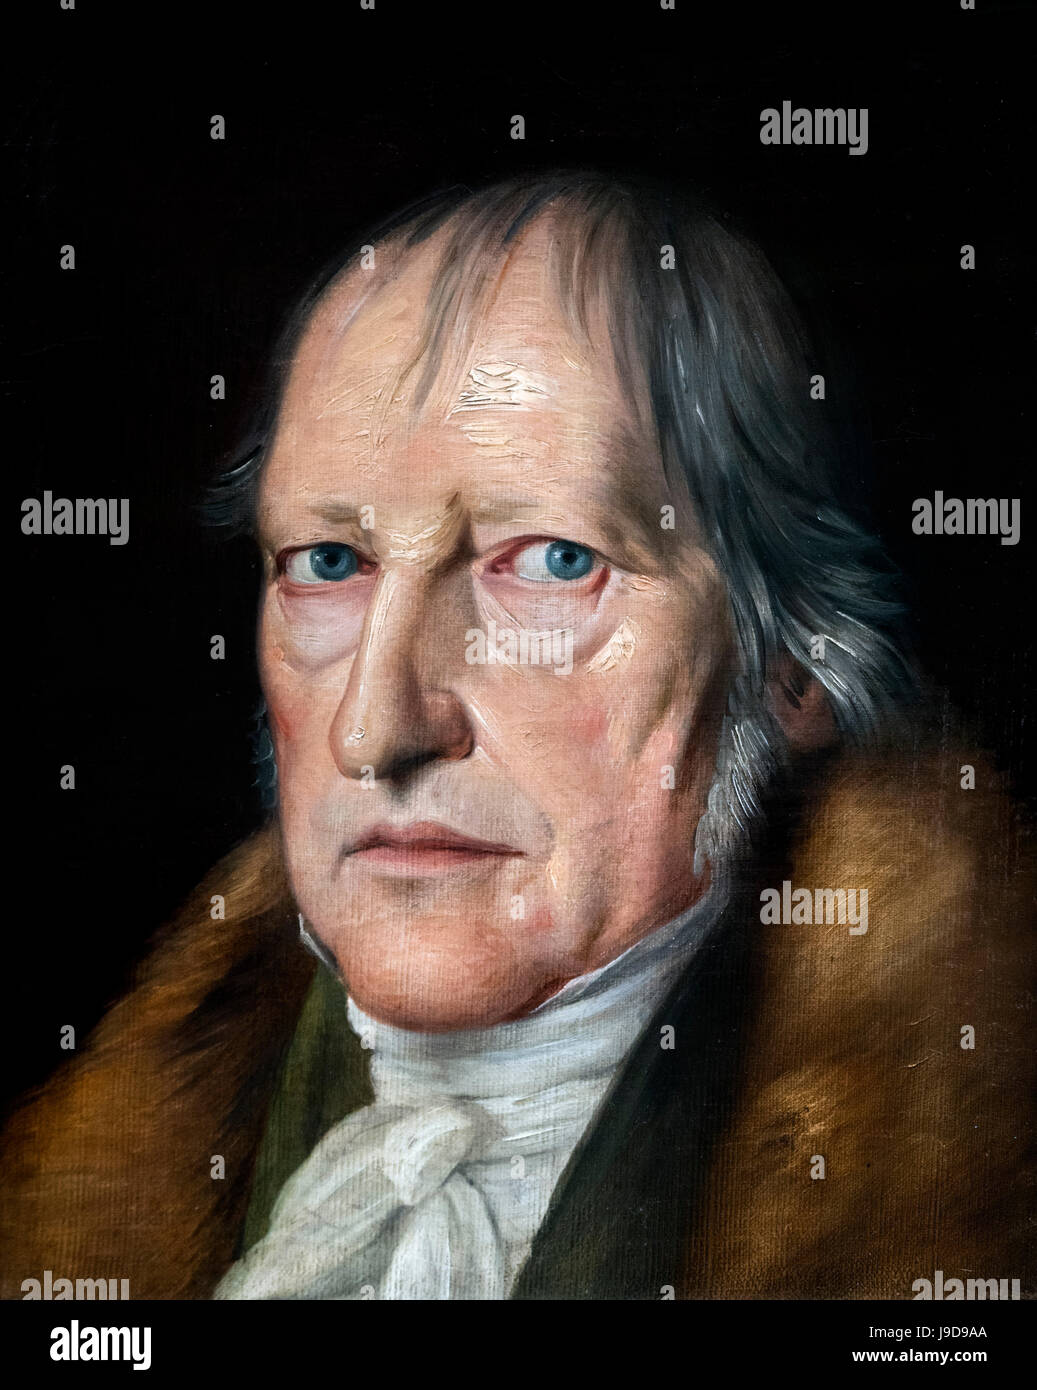 Hegel. Portrait of the German philosopher, Georg Wilhelm Friedrich Hegel (1770-1831) by Jacob Schlessinger, oil - Stock Image